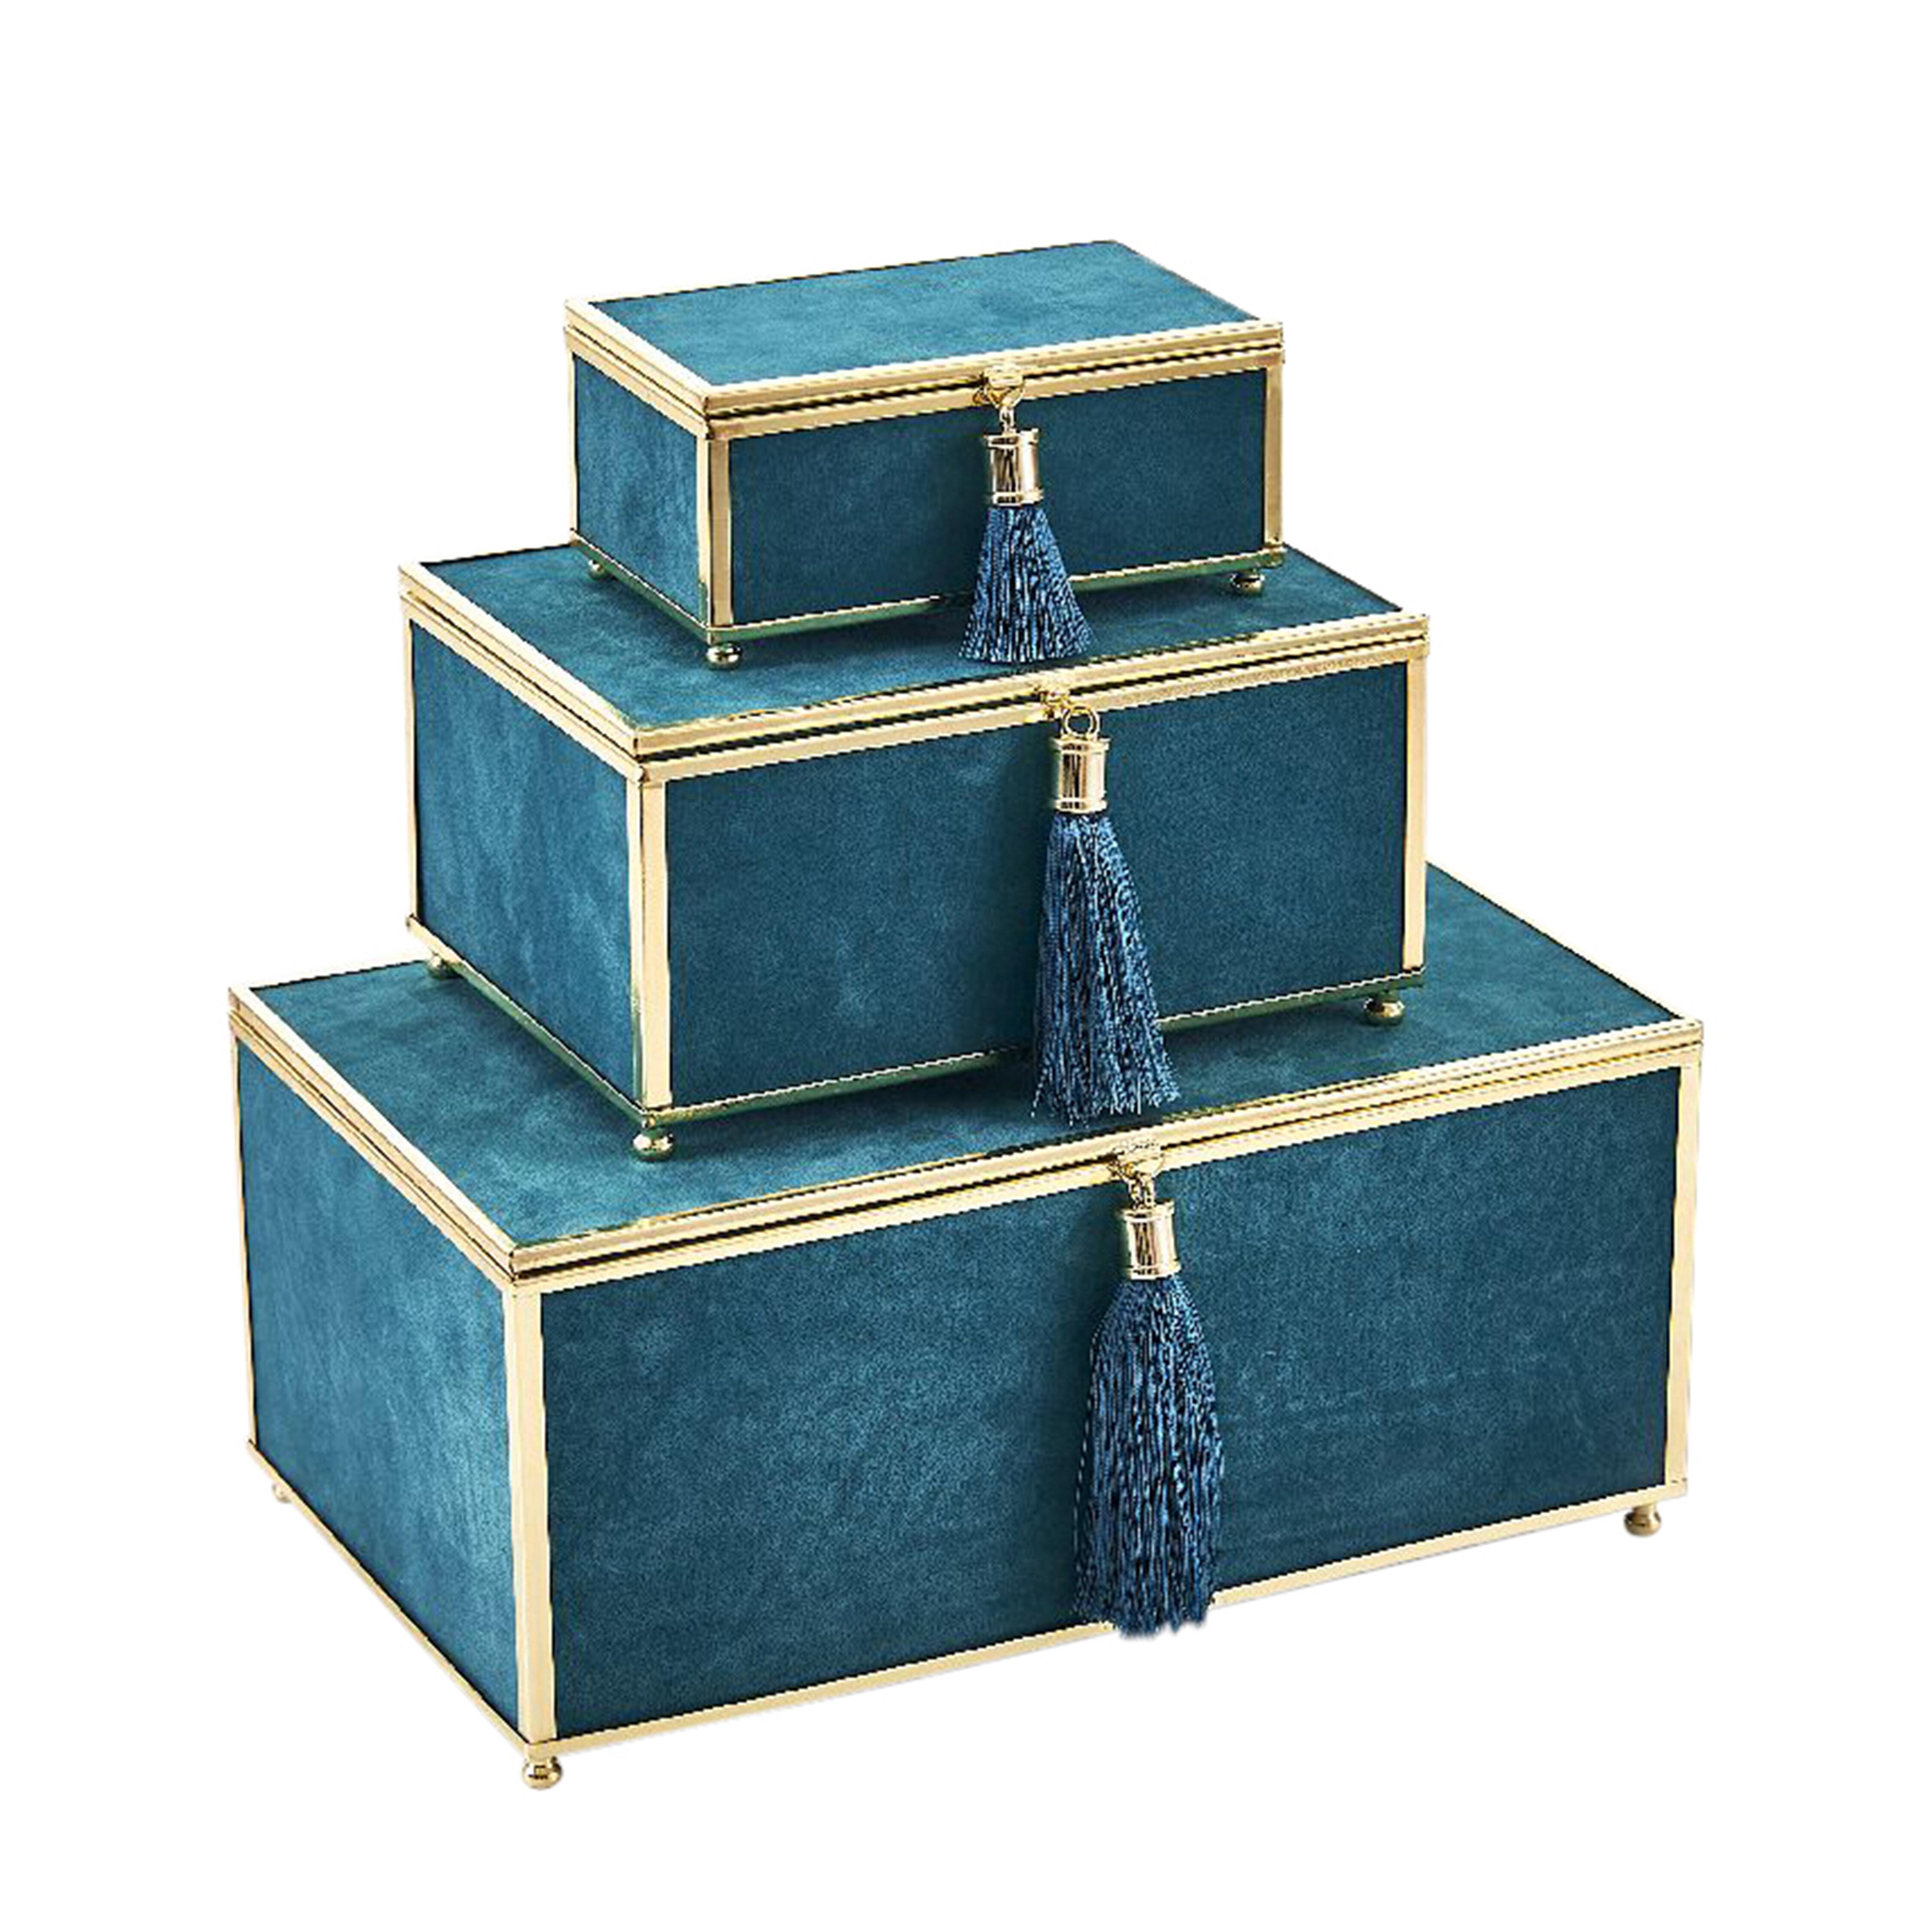 Mercer41 Ola Velve 3 Piece Decorative Box Set With Tel Reviews Wayfair